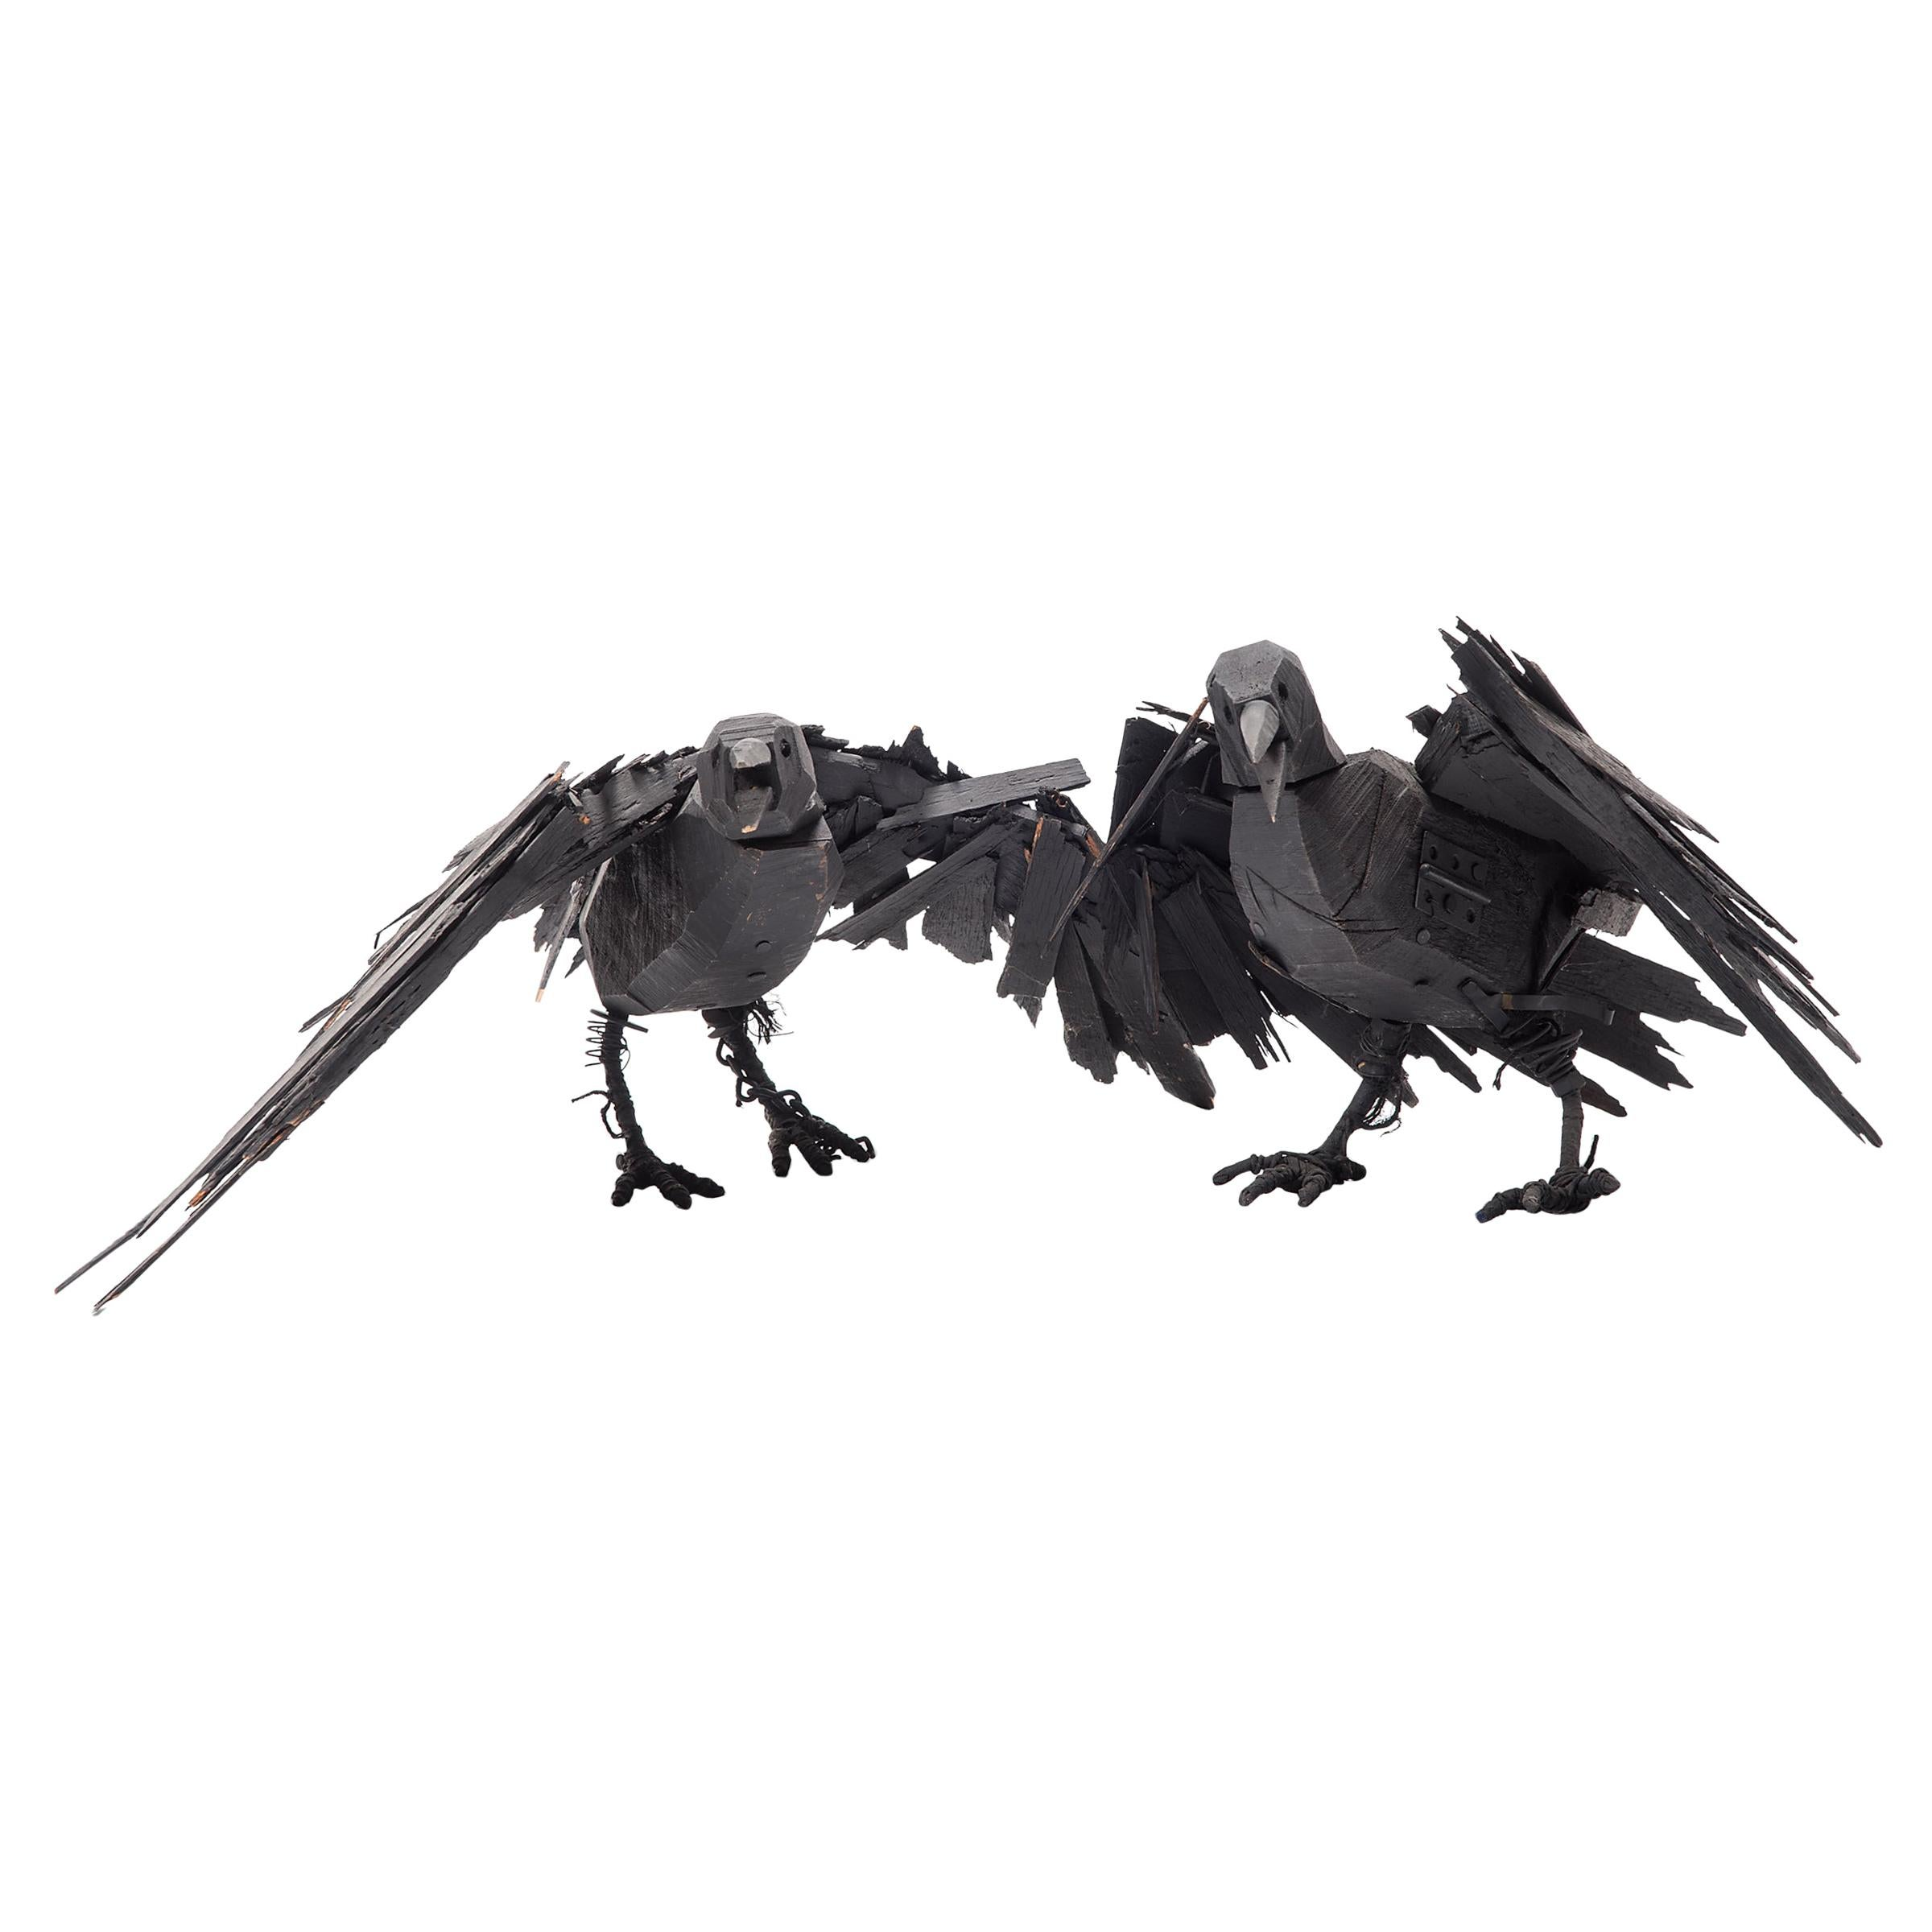 Pair of Wooden Folk Art Crows